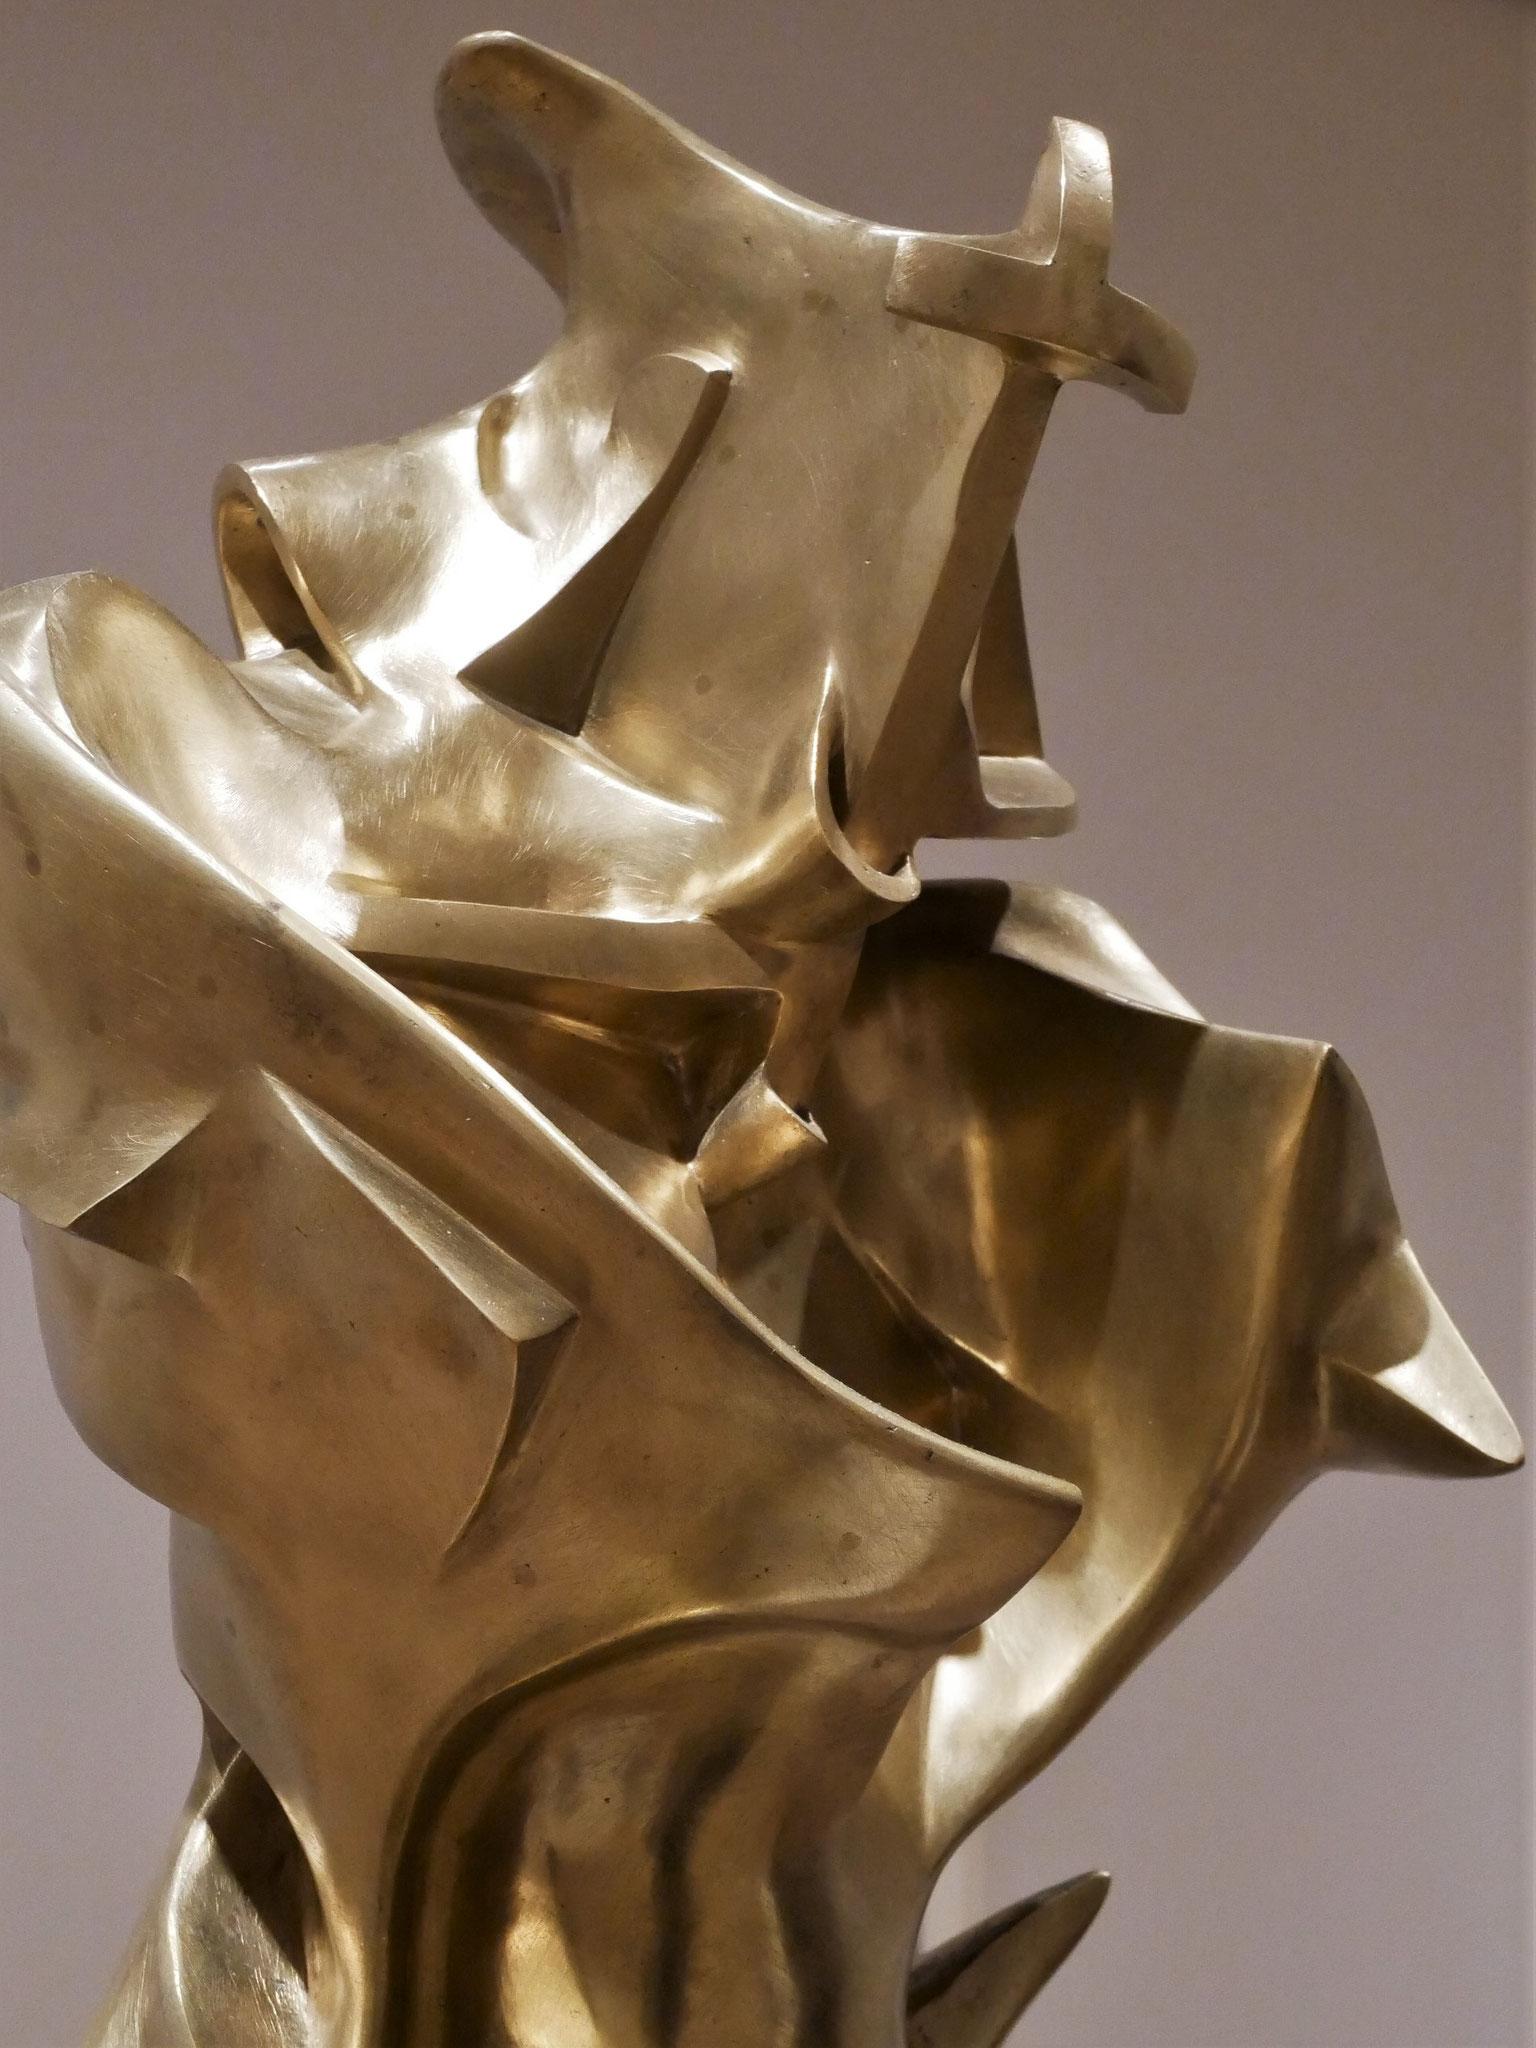 Umberto Boccioni, Unique Forms of Continuity in Space, 1913 (cast 1931 or 1934)